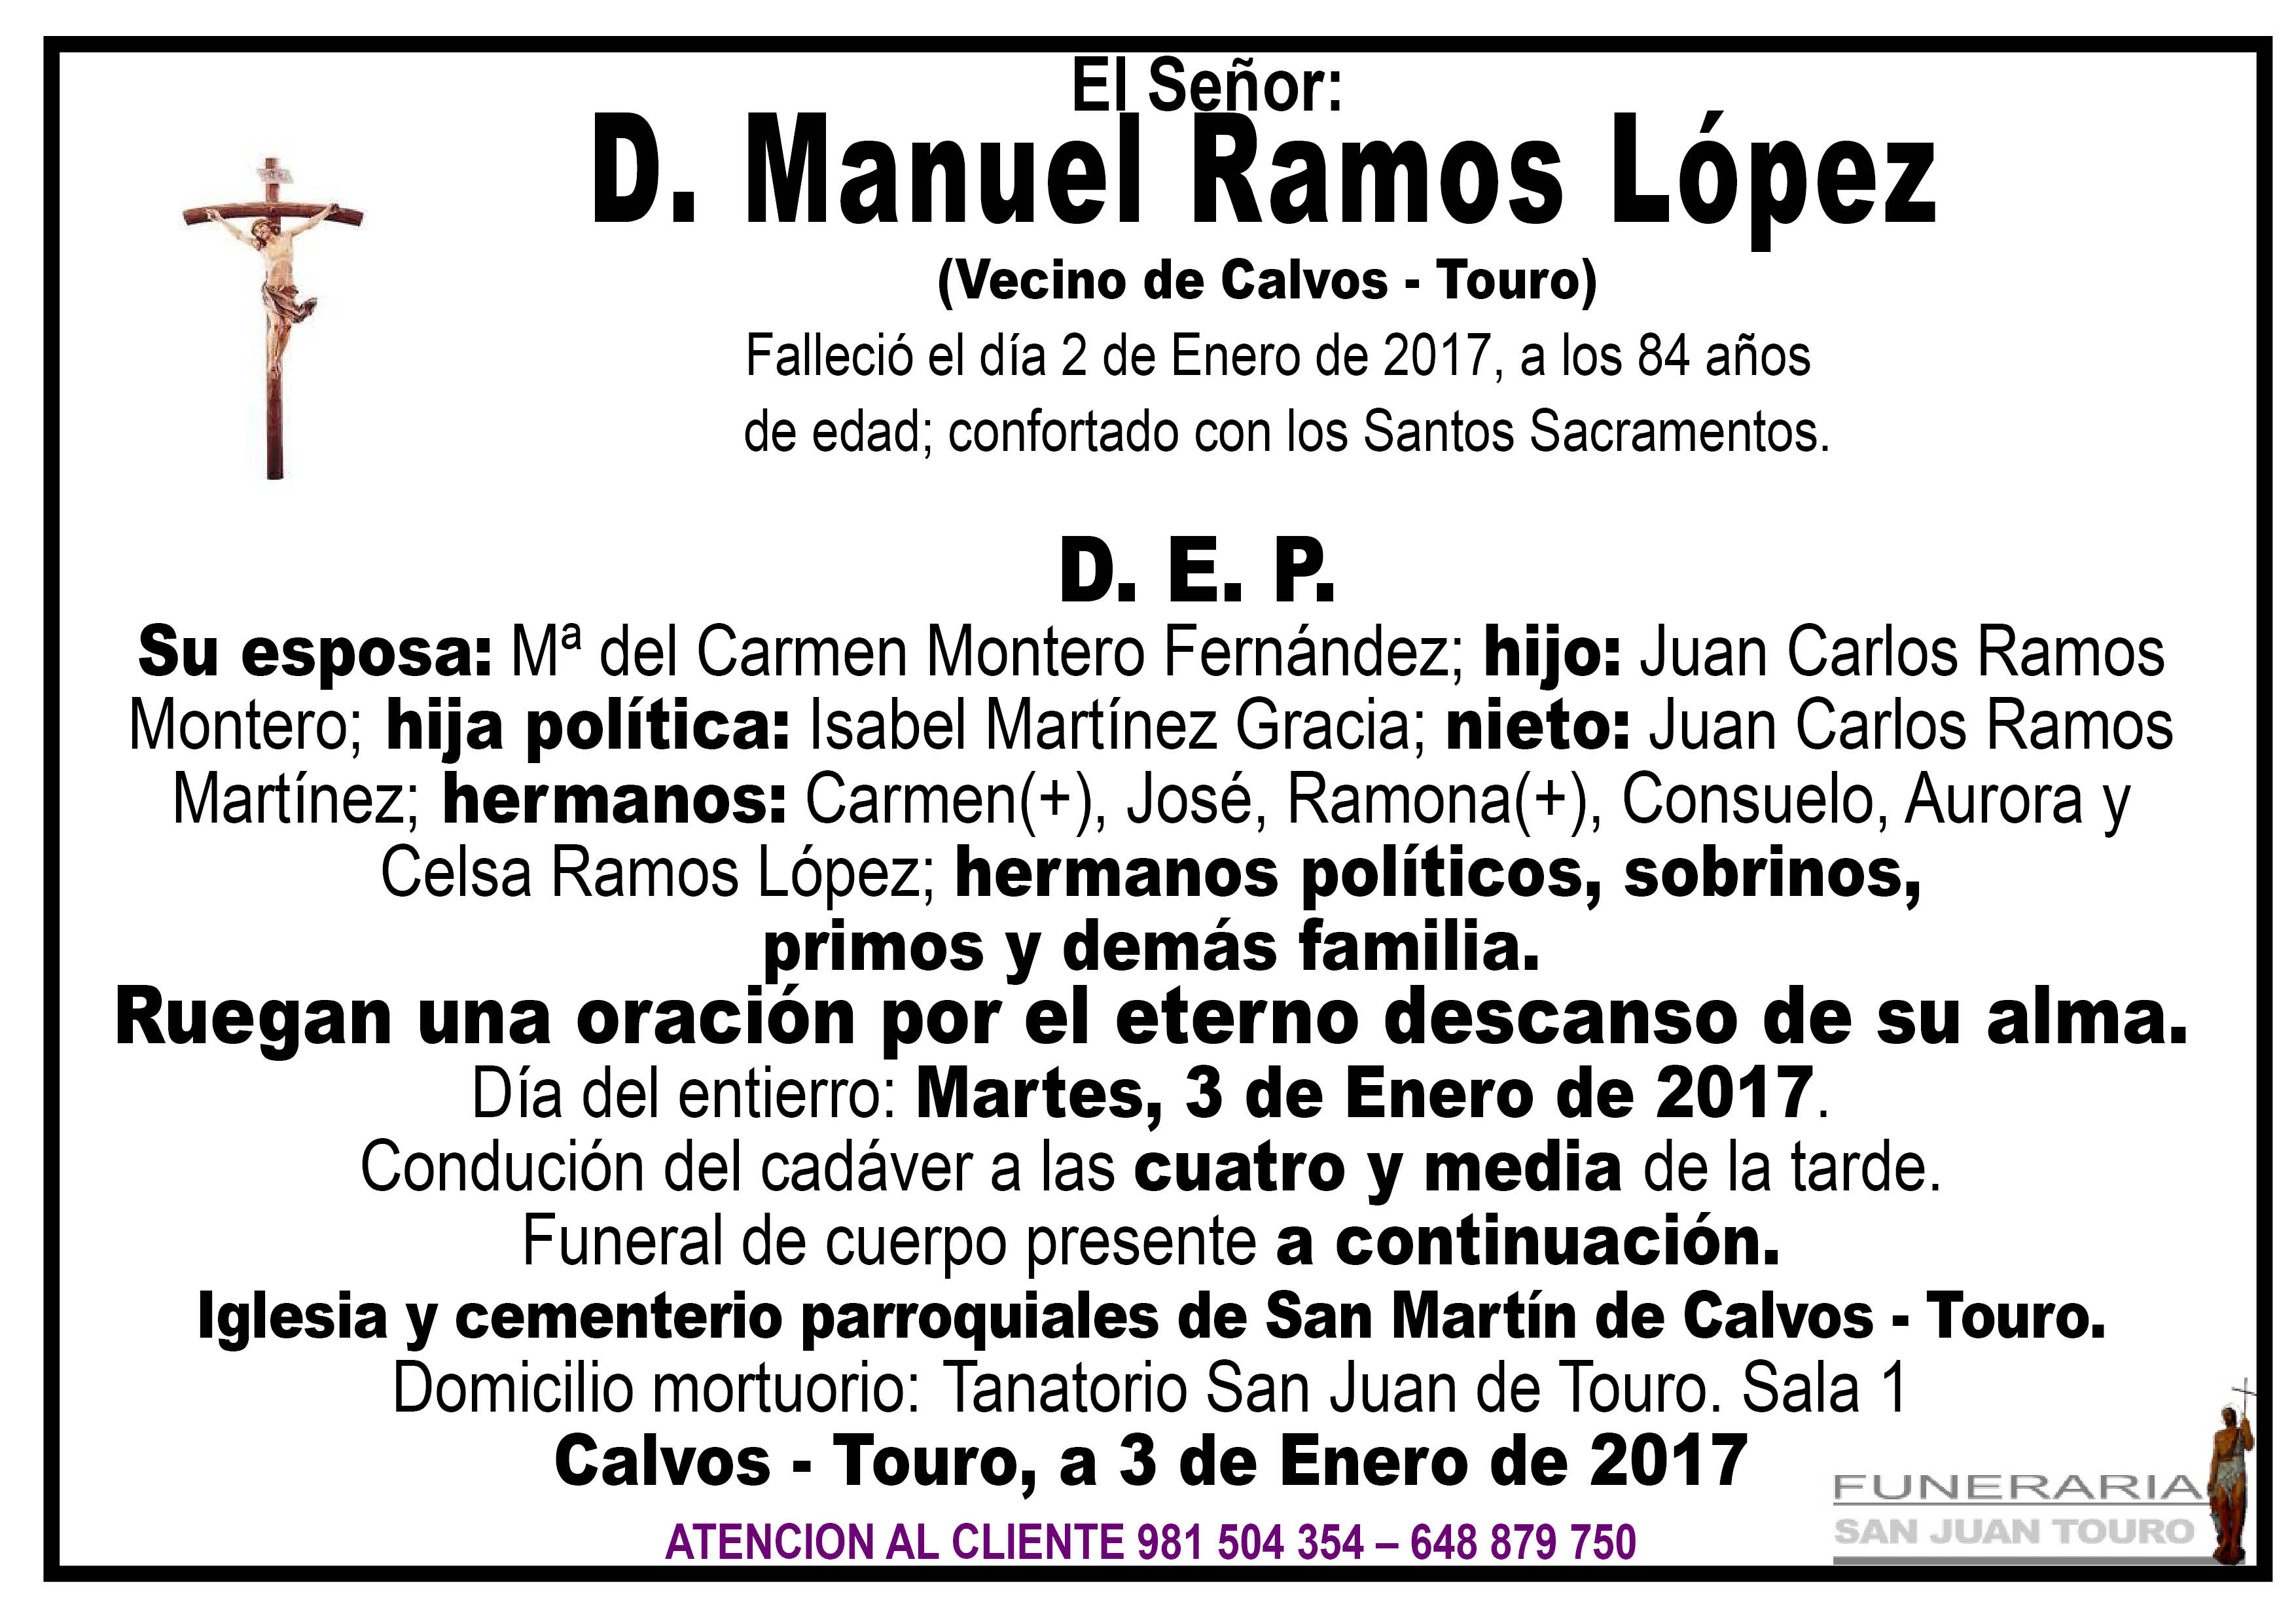 Esquela de SEPELIO DE D MANUEL RAMOS LÓPEZ